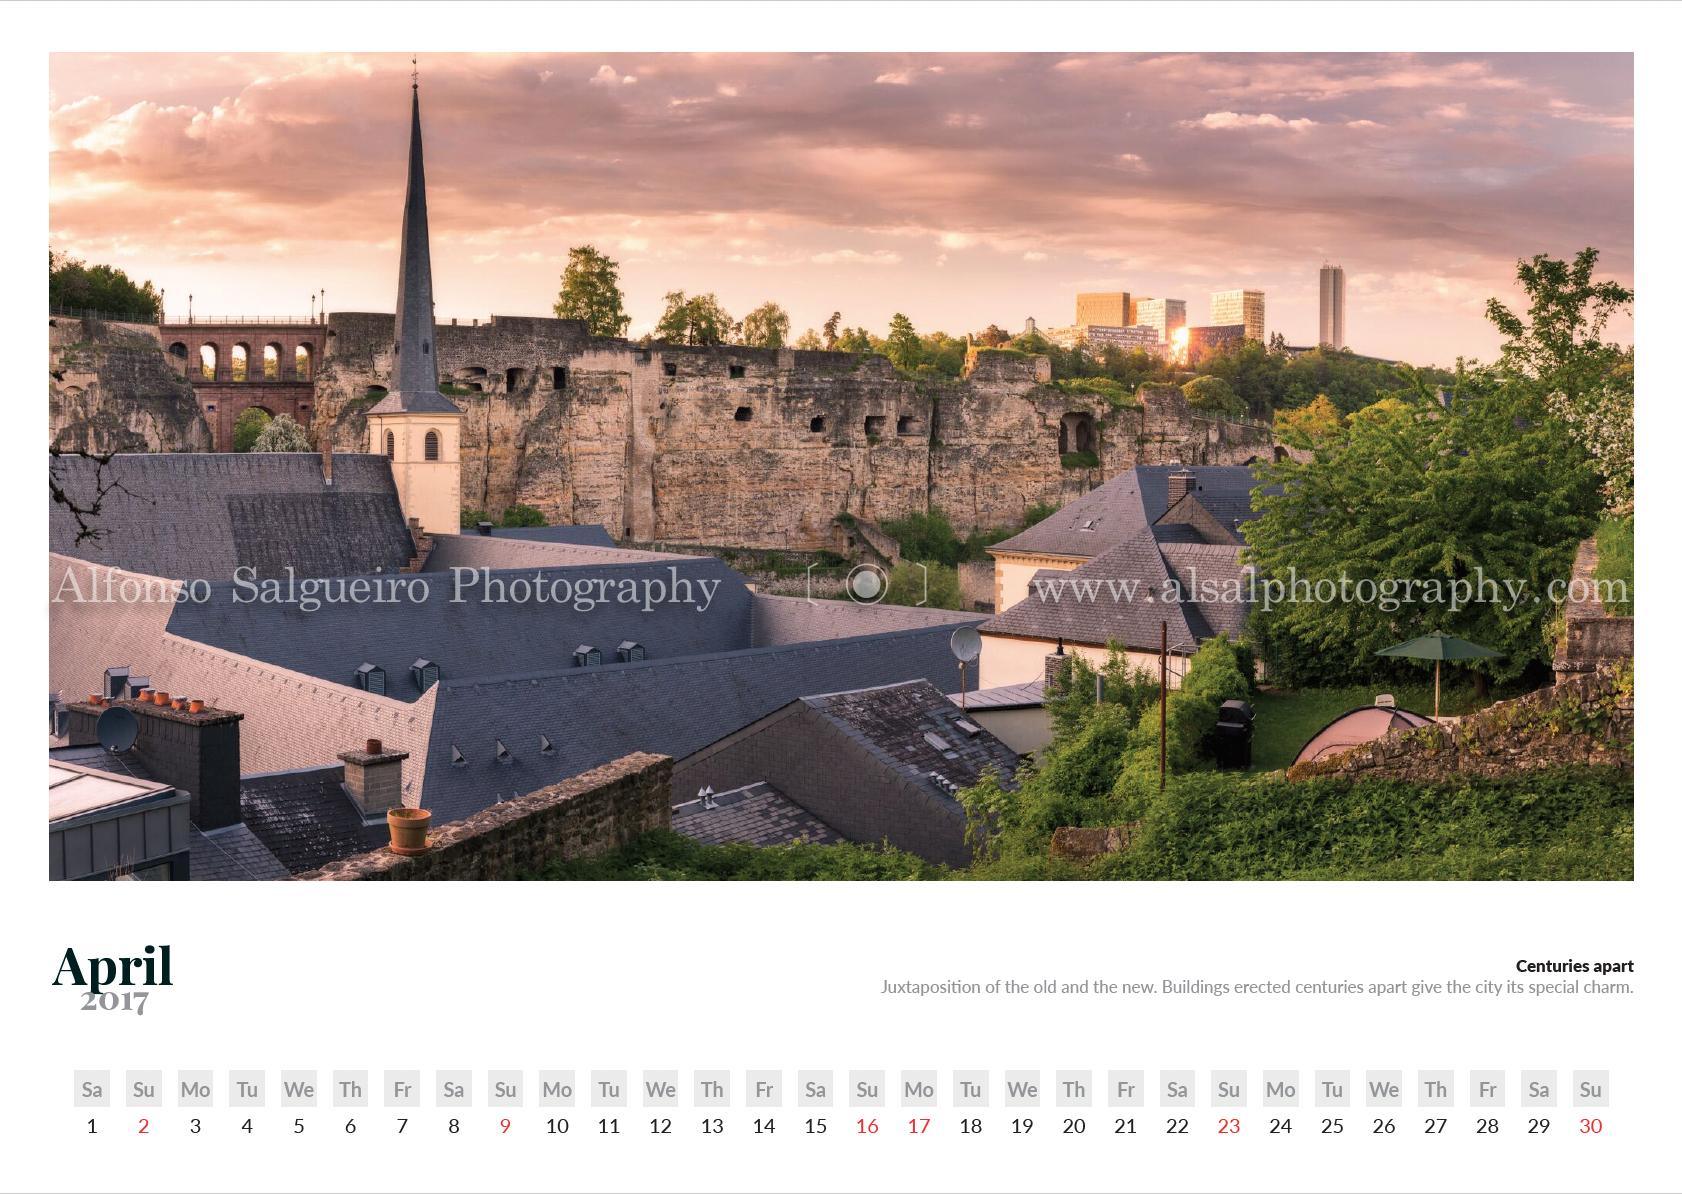 Luxembourg 2017 calendar-5.jpg